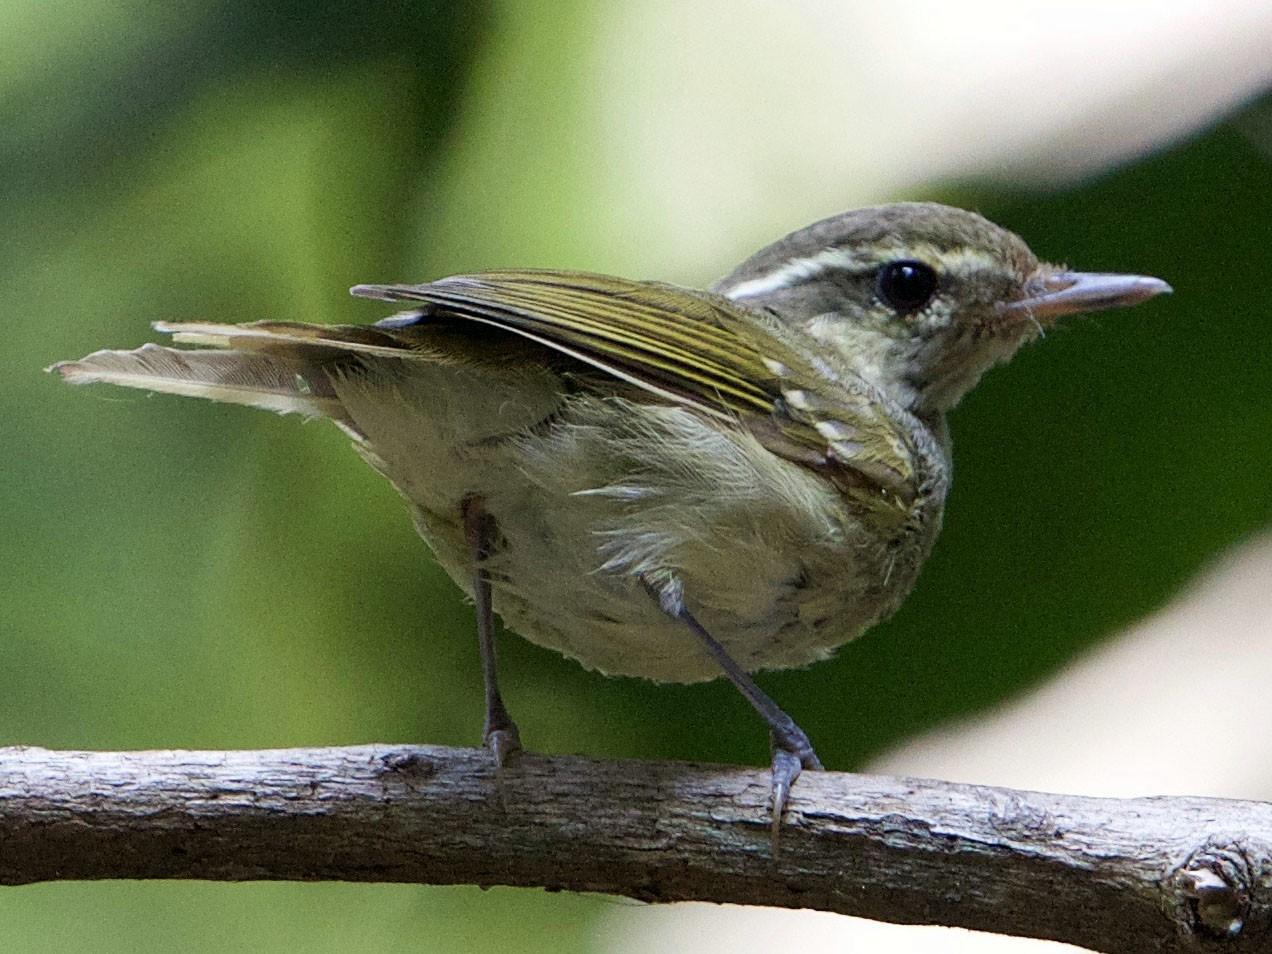 Large-billed Leaf Warbler - Snehasis Sinha